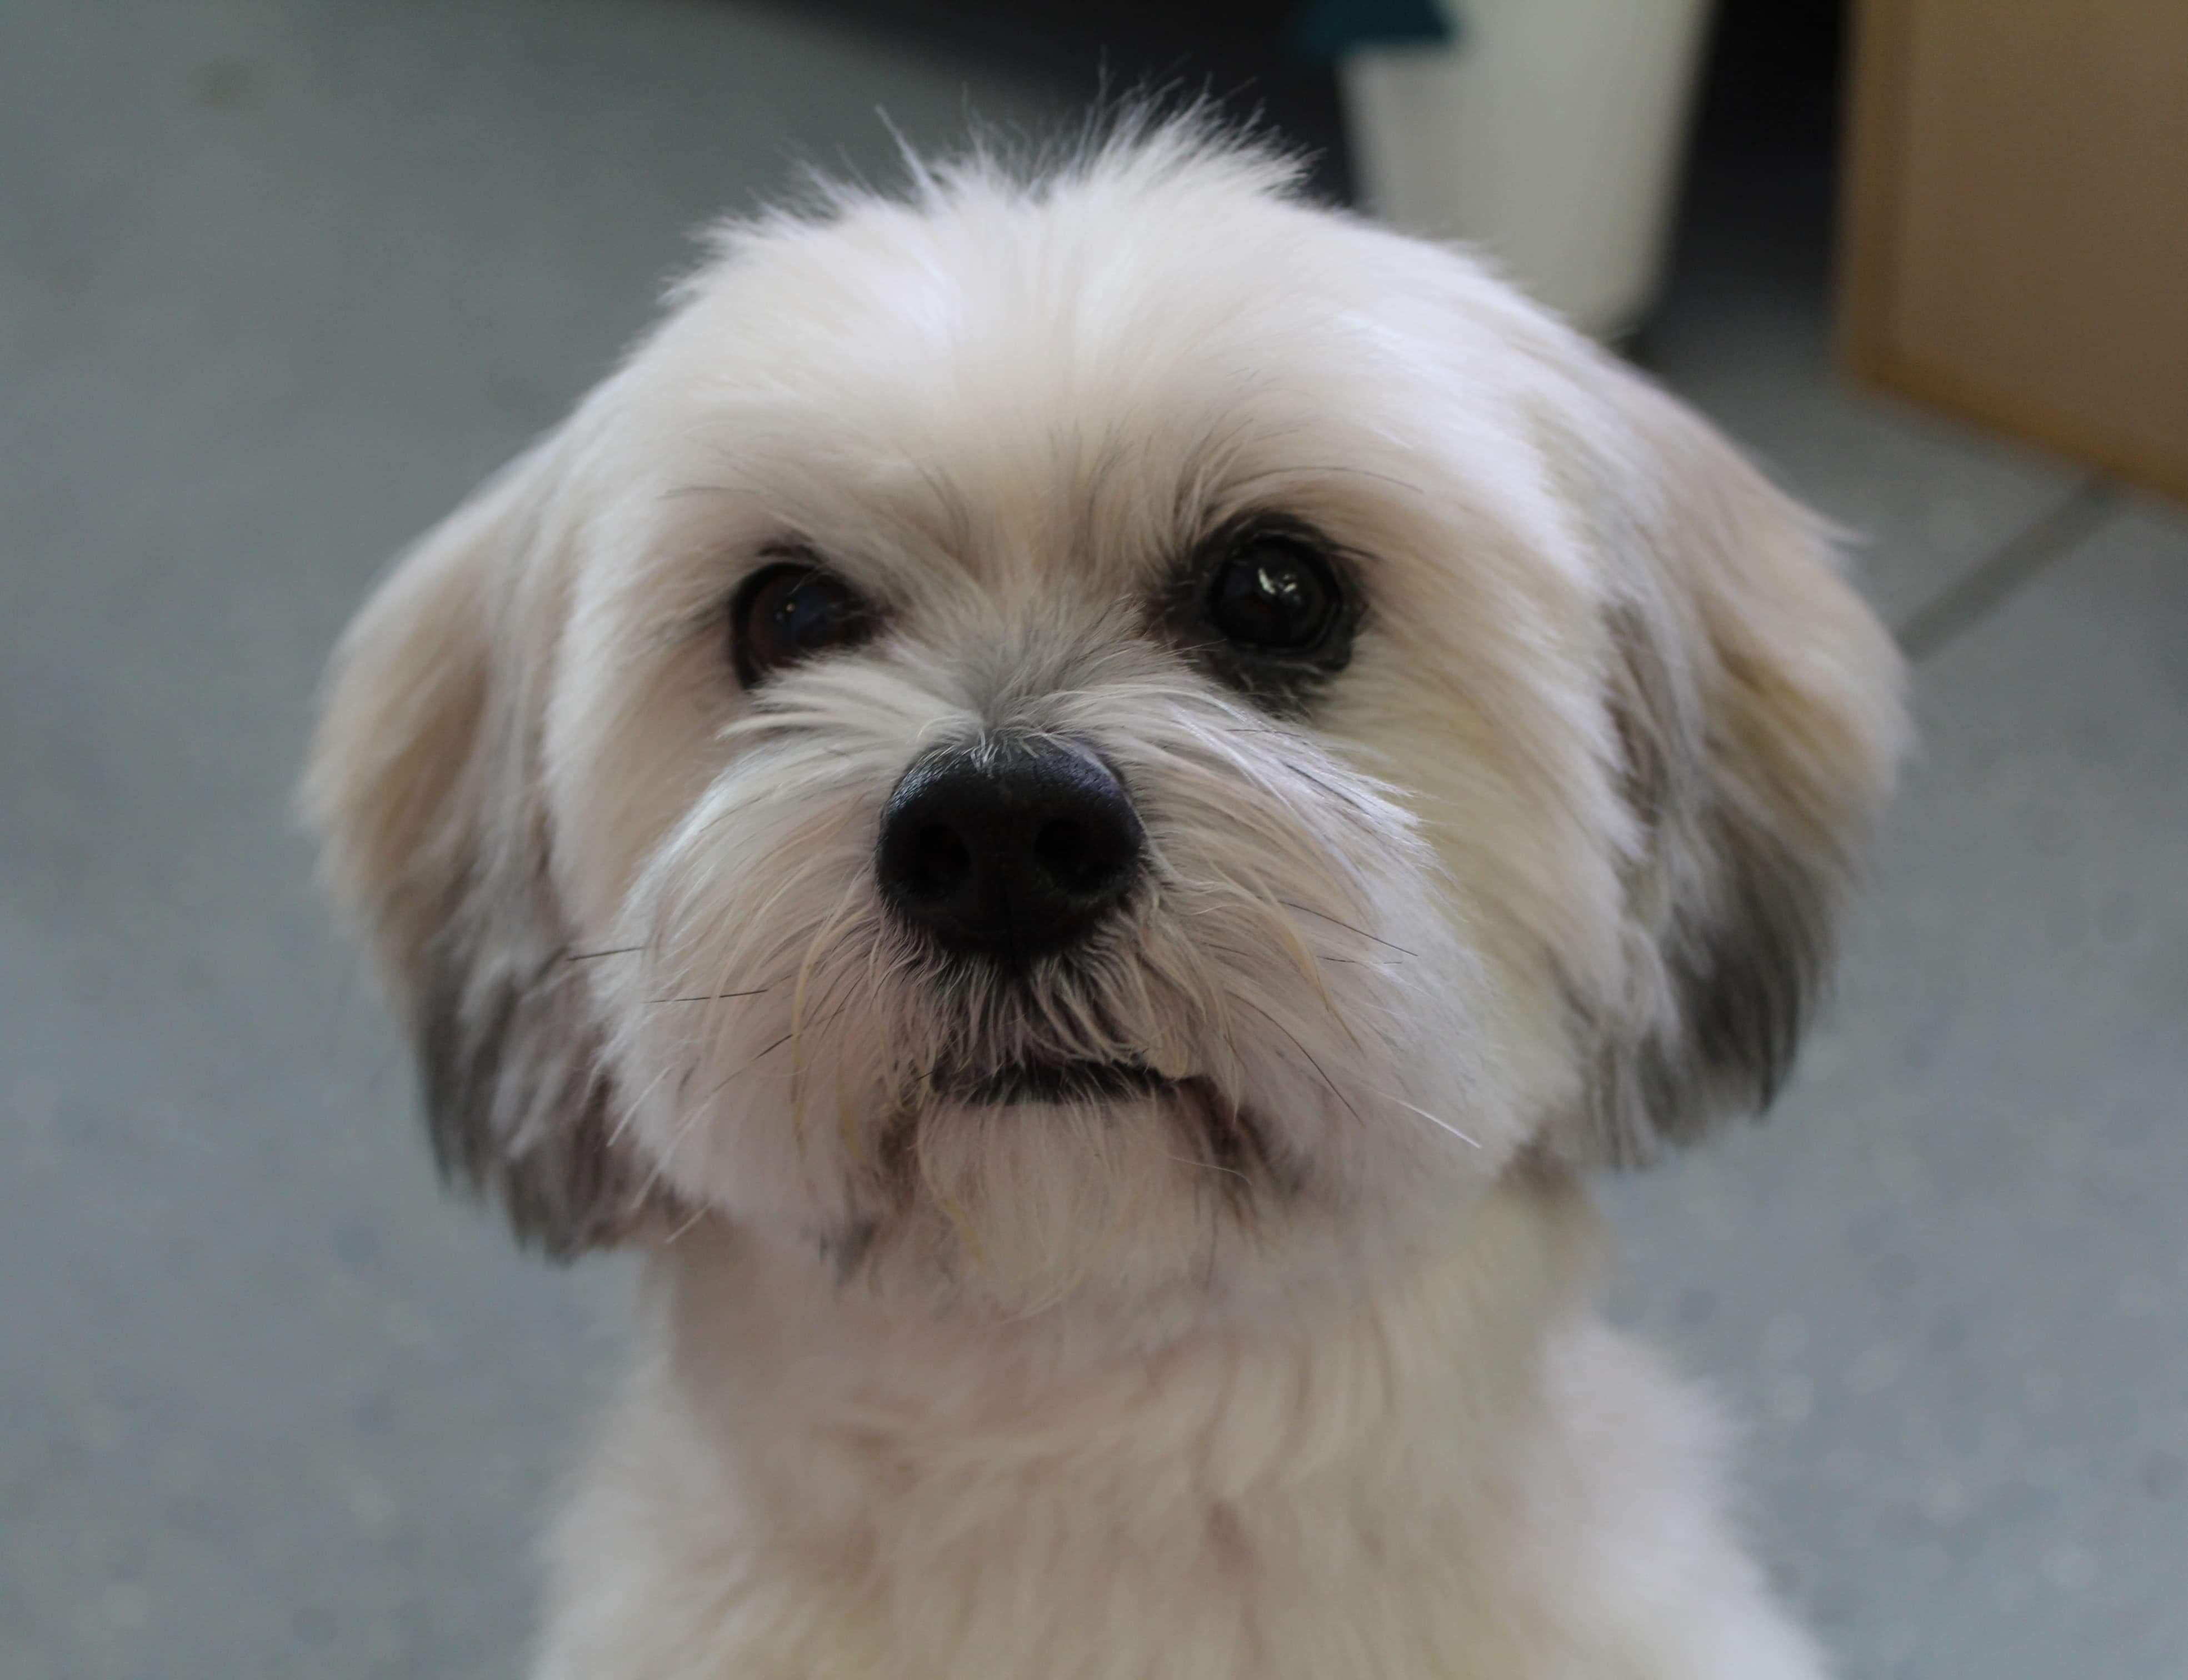 Adopt Chelsea Turner On Dog Adoption Lhasa Apso Help Homeless Pets